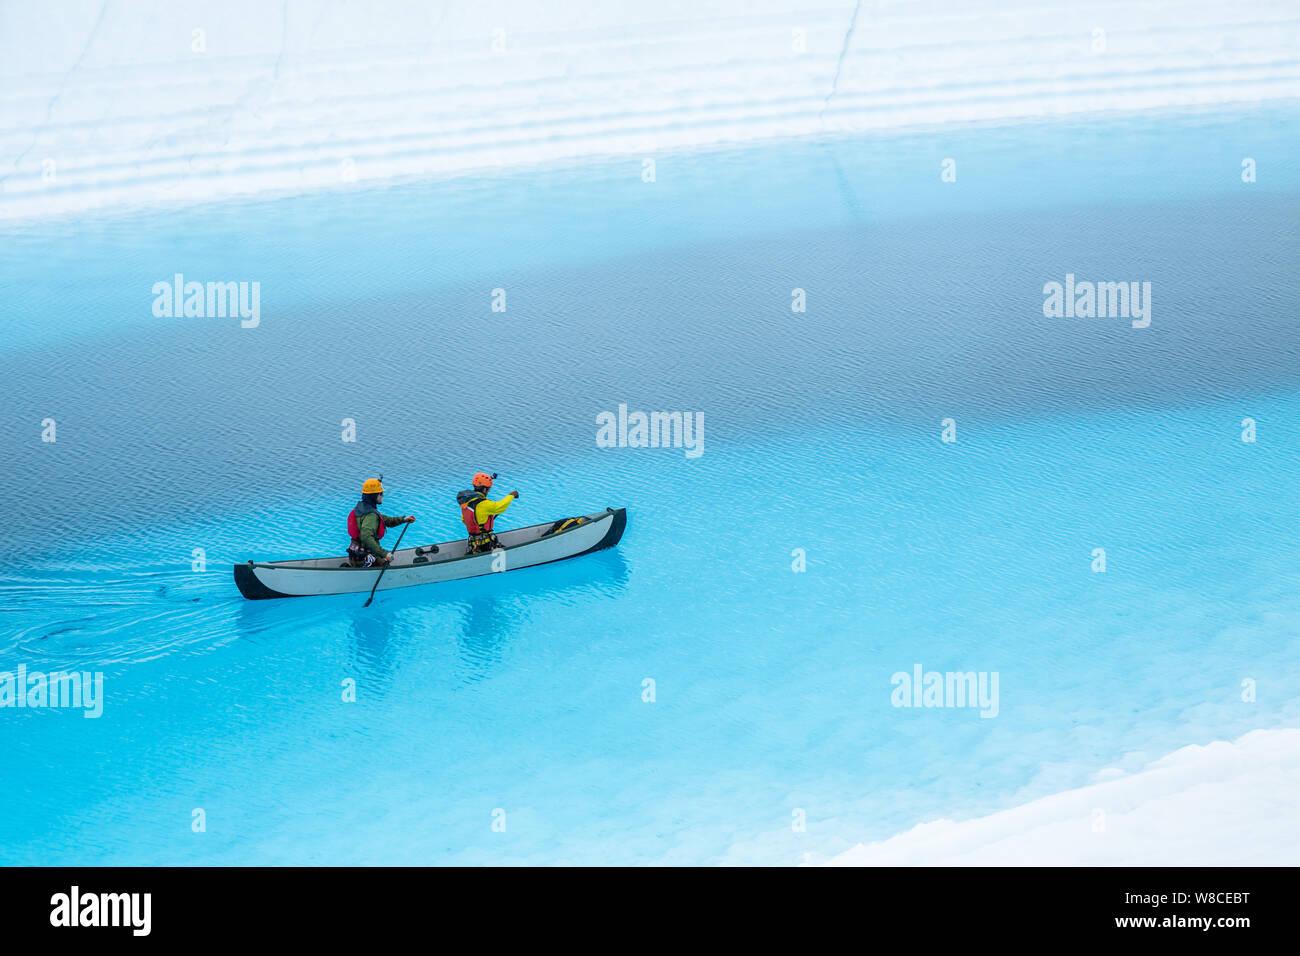 Dos hombres remar una canoa inflable en la parte superior de una piscina azul en el Glaciar Matanuska en el desierto de Alaska. El lago azul es un lago supraglacial, Foto de stock